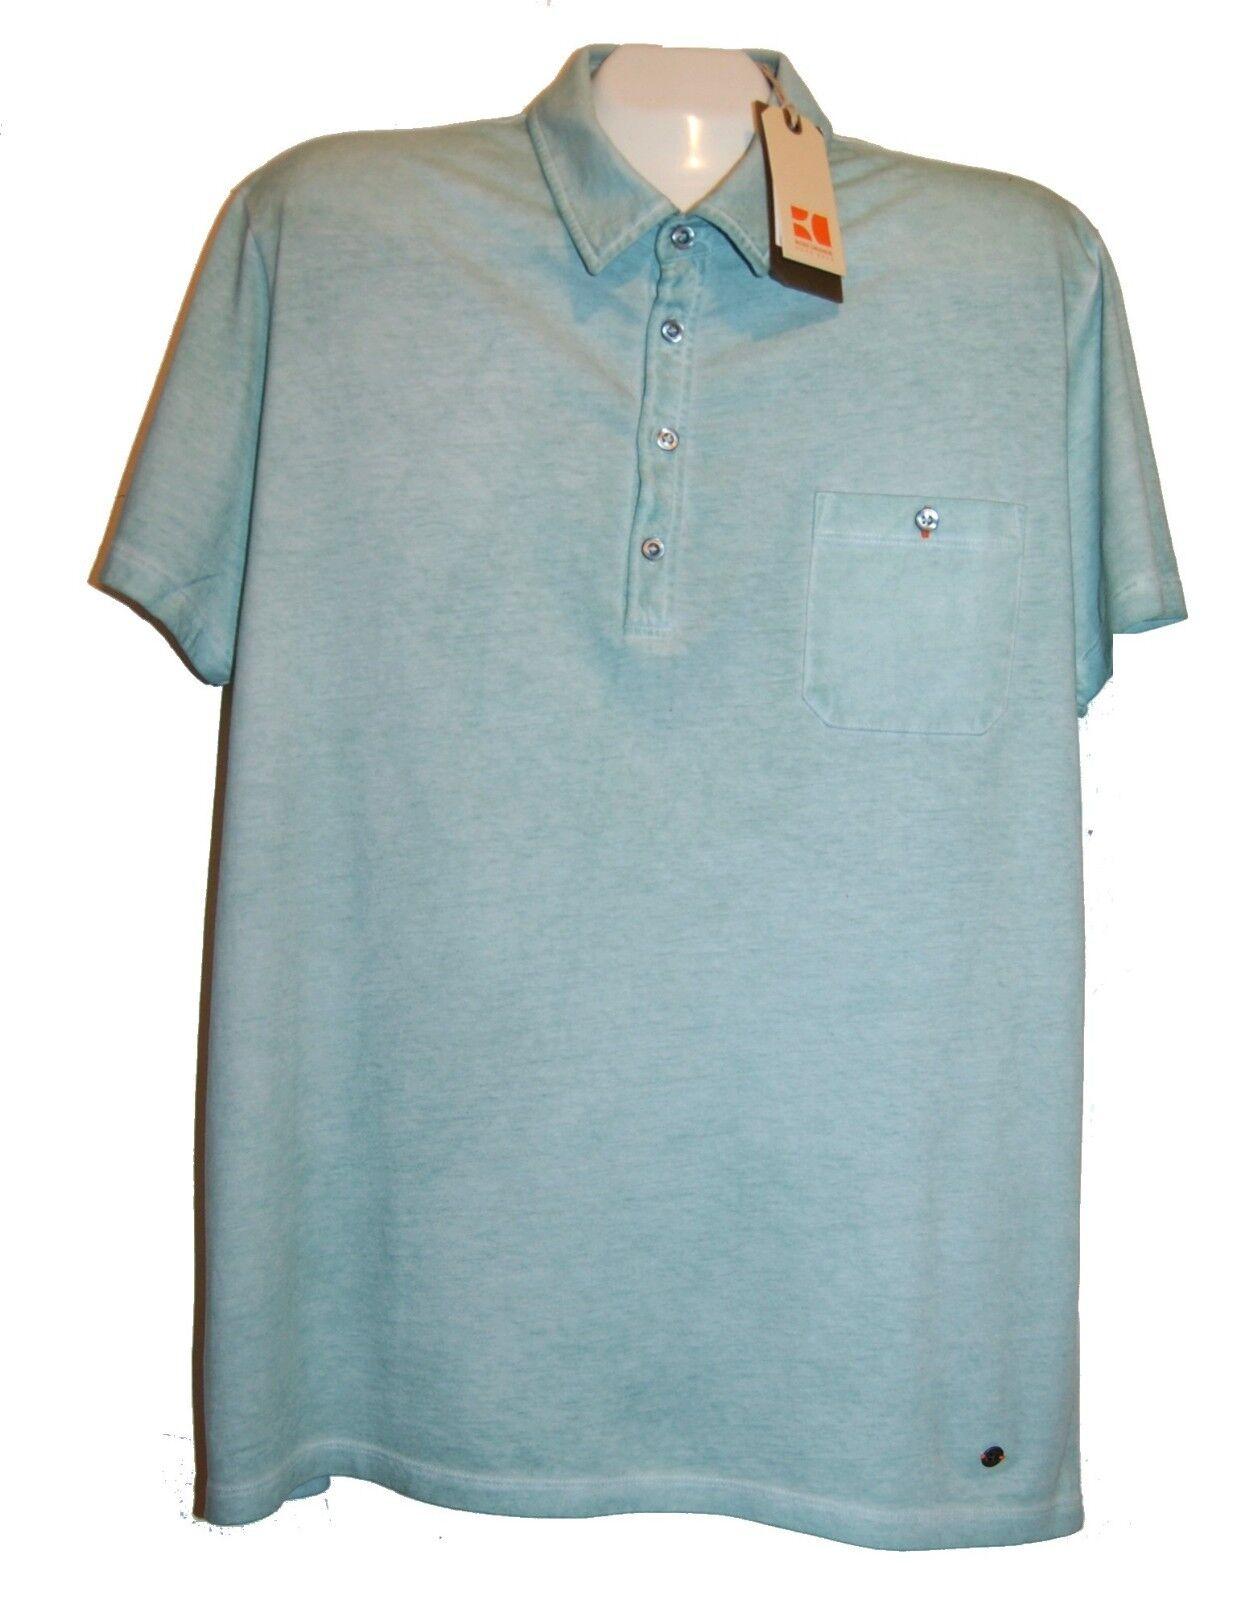 HUGO BOSS Light Teal Green 100% Cotton Slim Fit MEN'S Polo Shirt Size 2XL NEW